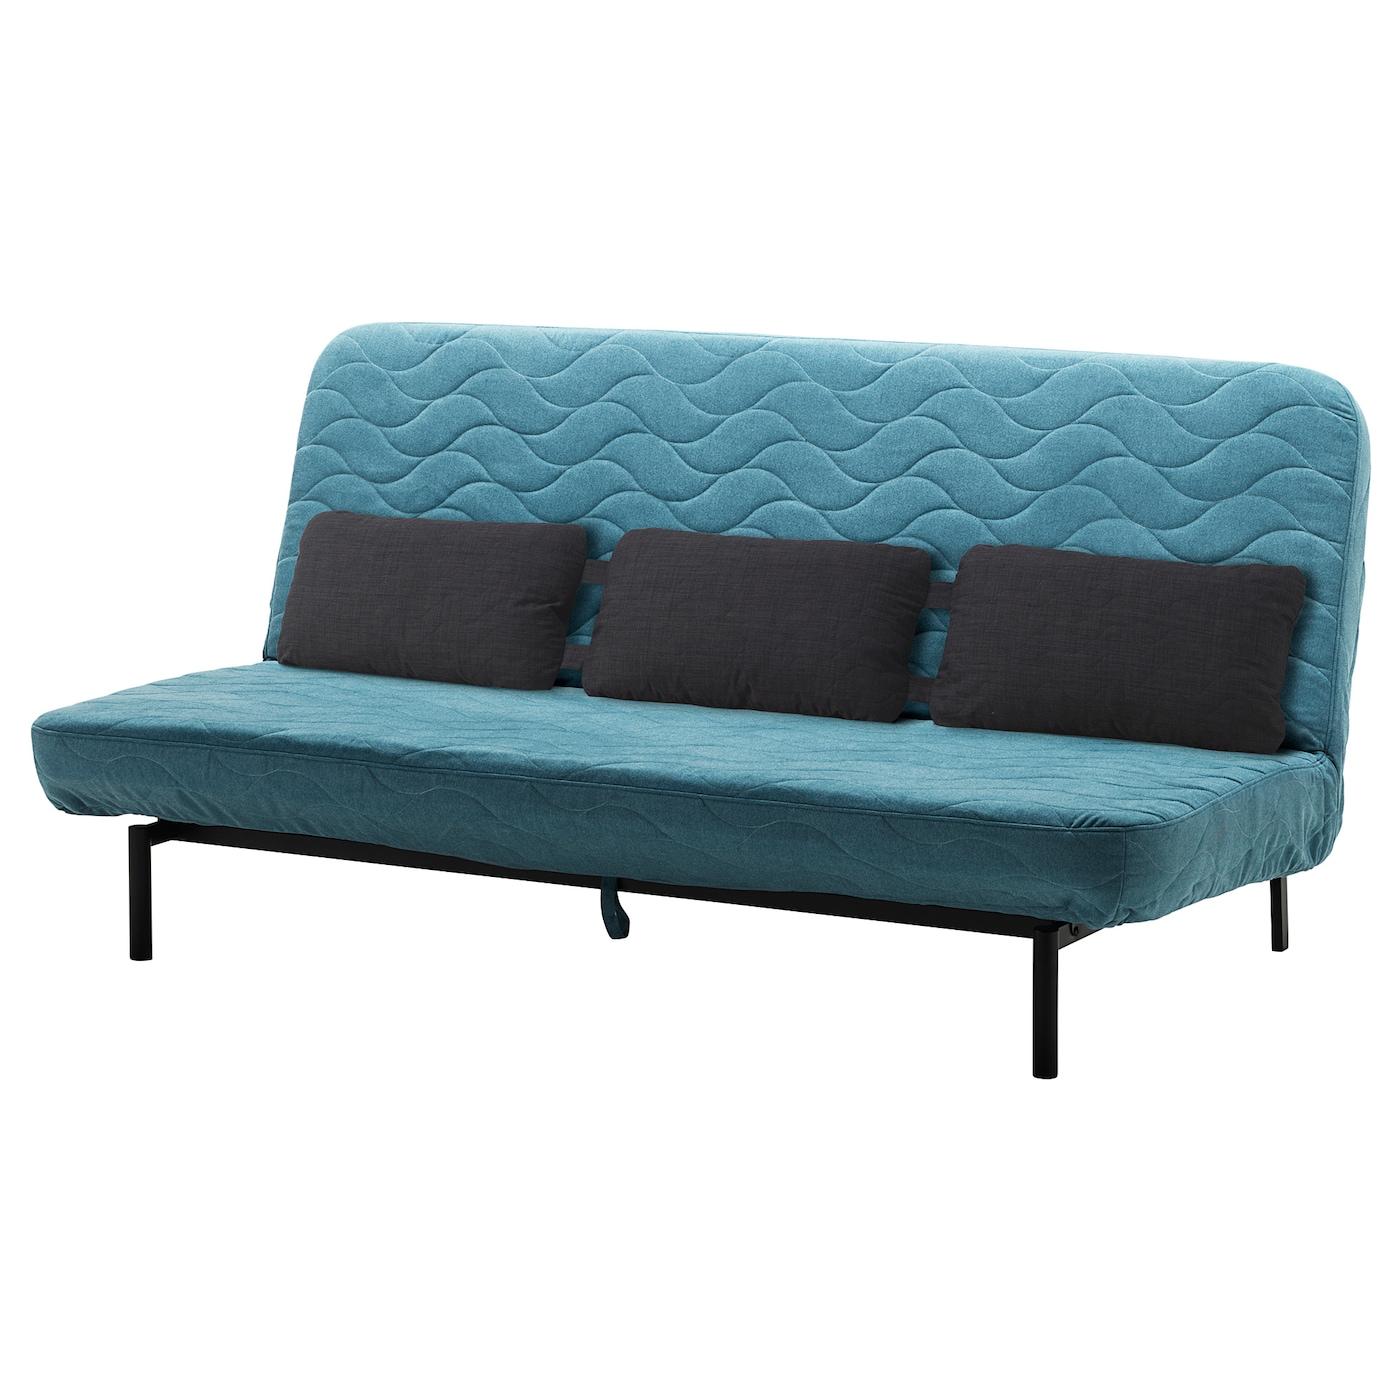 Ikea Nyhamn Sofa Bed With Triple Cushion